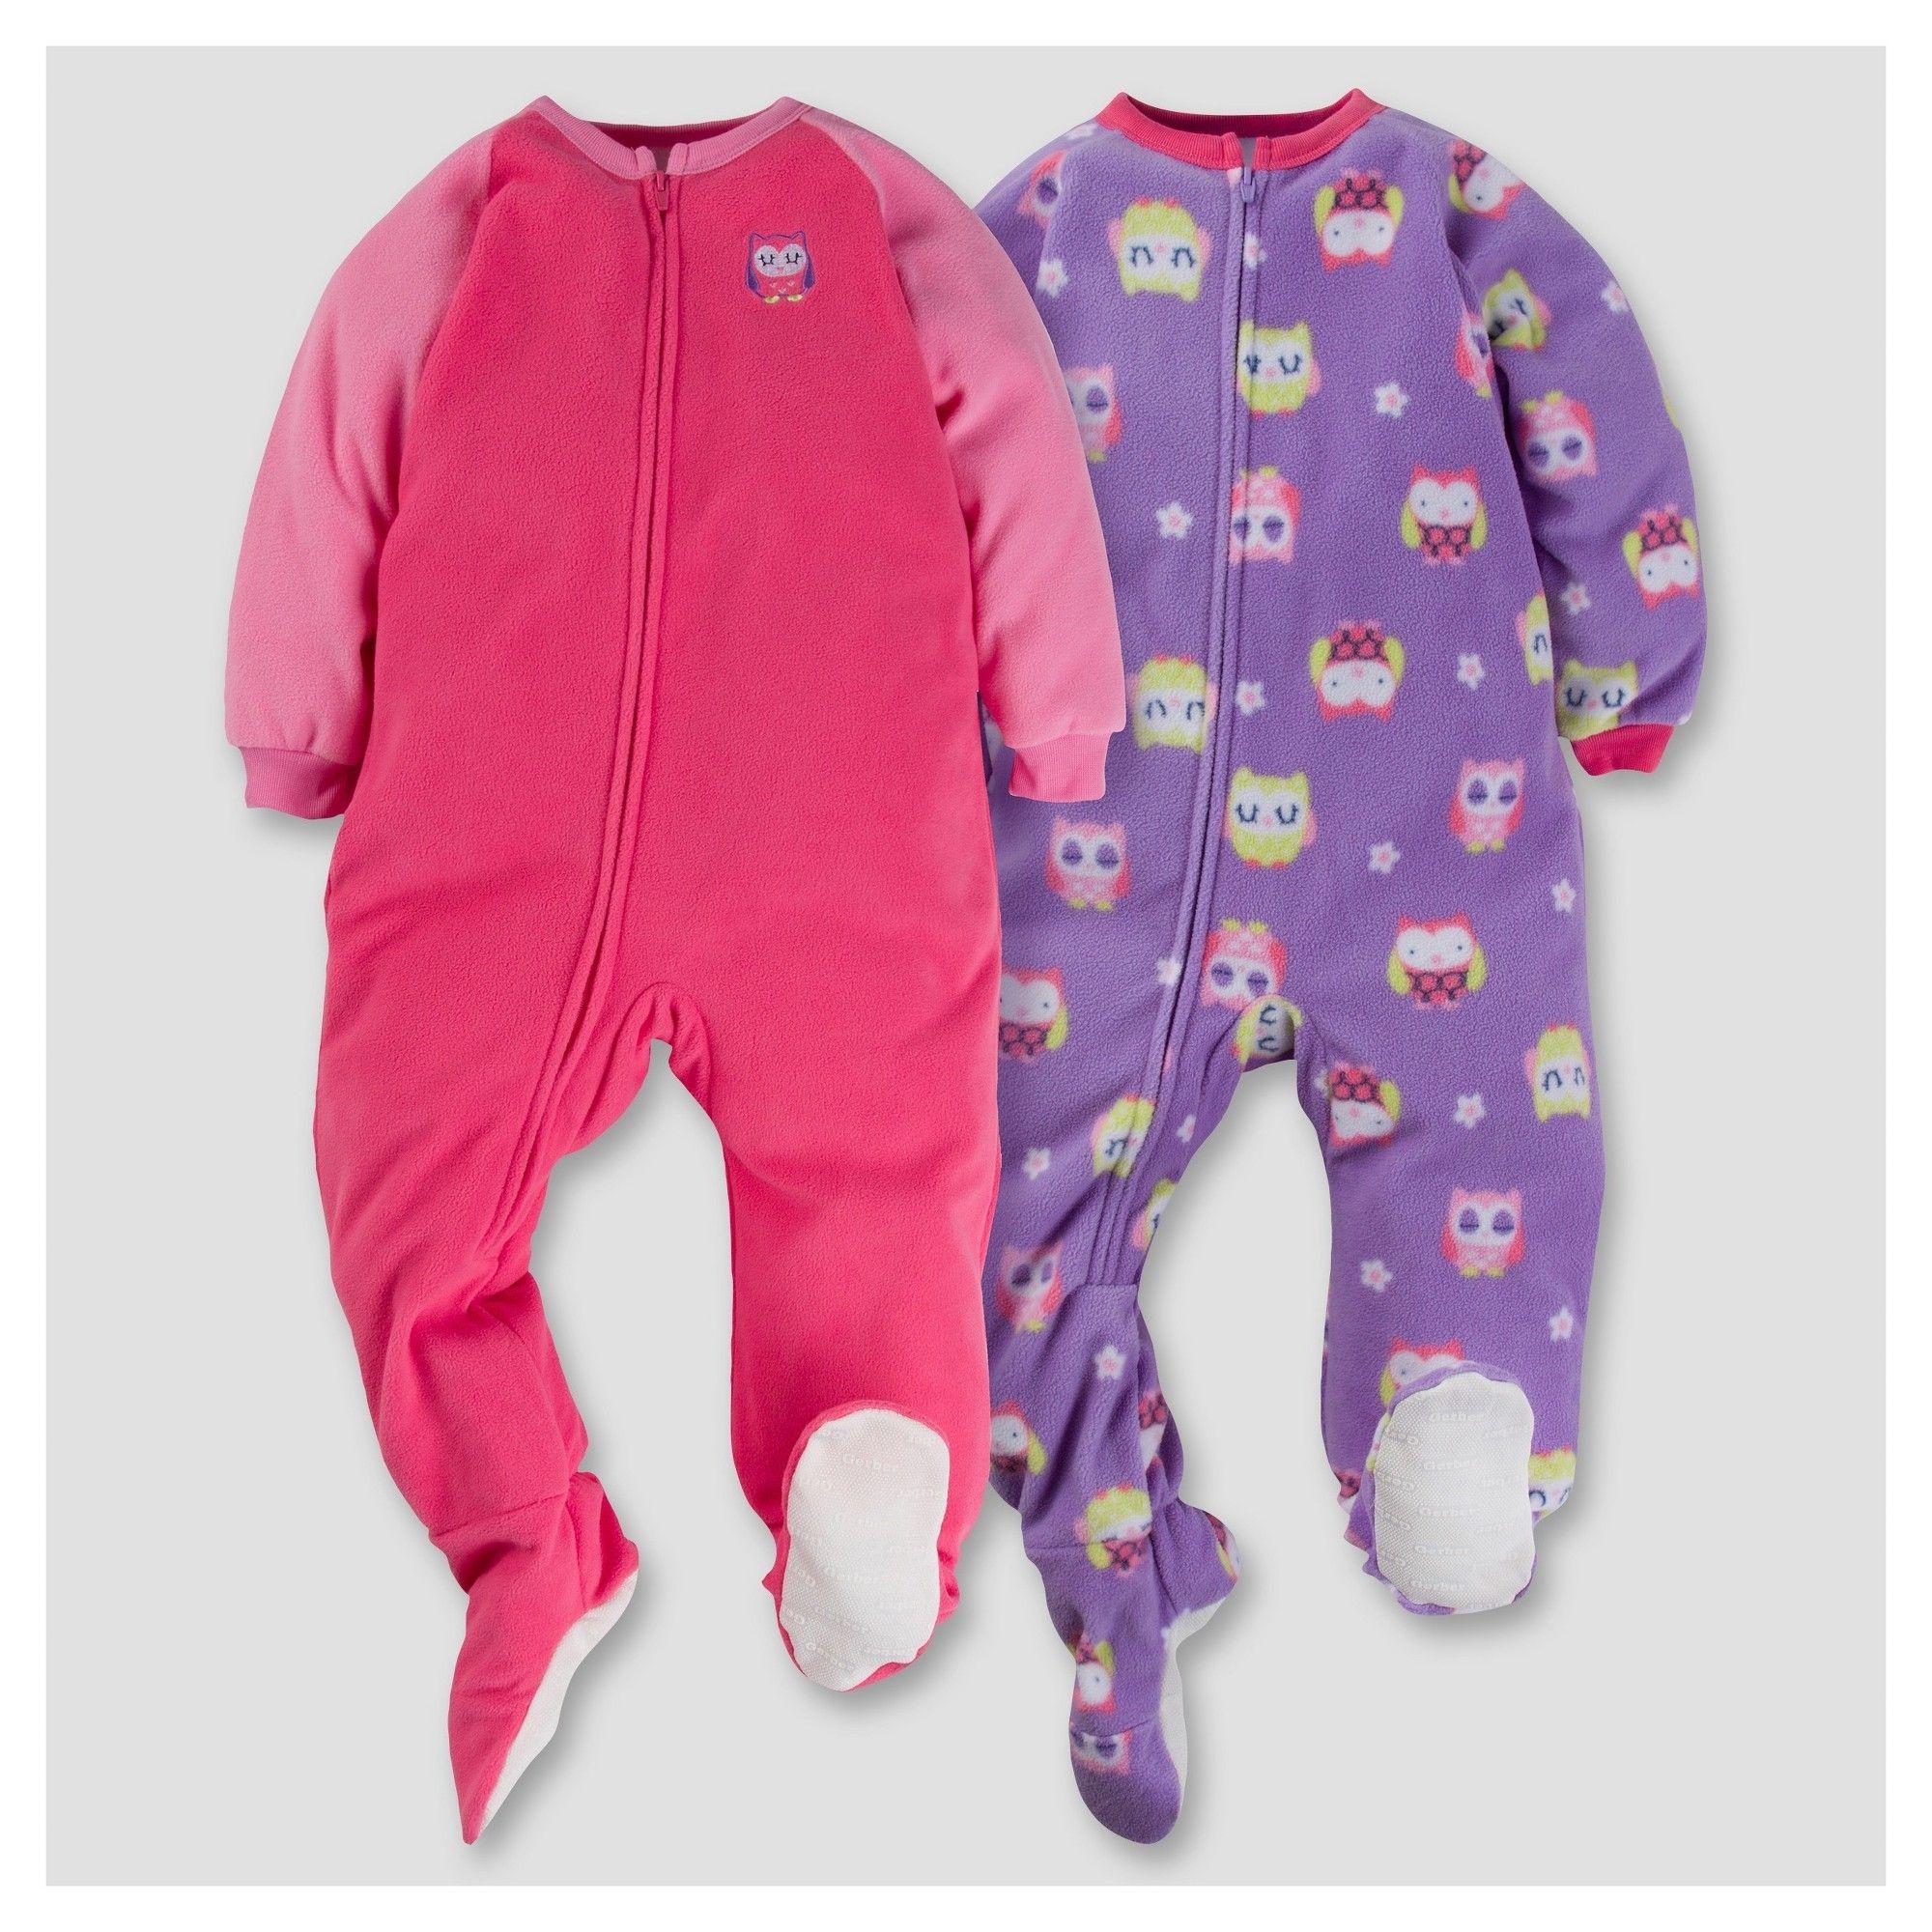 Gerber Toddler Girl 2pk Sleepy Owl Microfleece Zip-Front Footed Blanket  Sleepers - Pink 4T c26170331